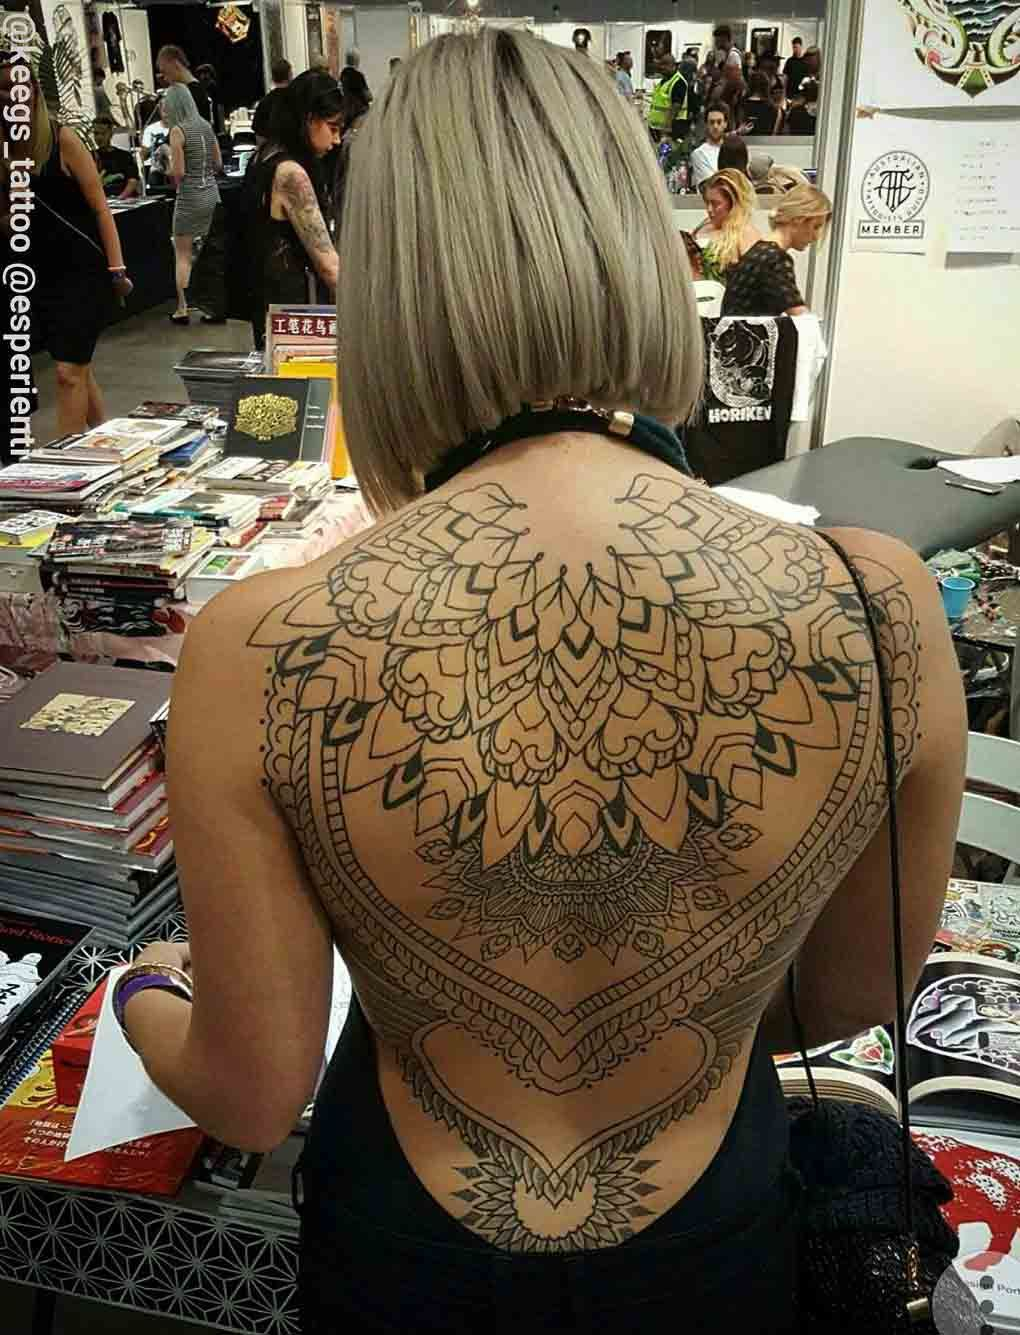 Female Back Tattoo Tattoos Back Tattoo Women Tattoos Full Back for dimensions 1020 X 1335